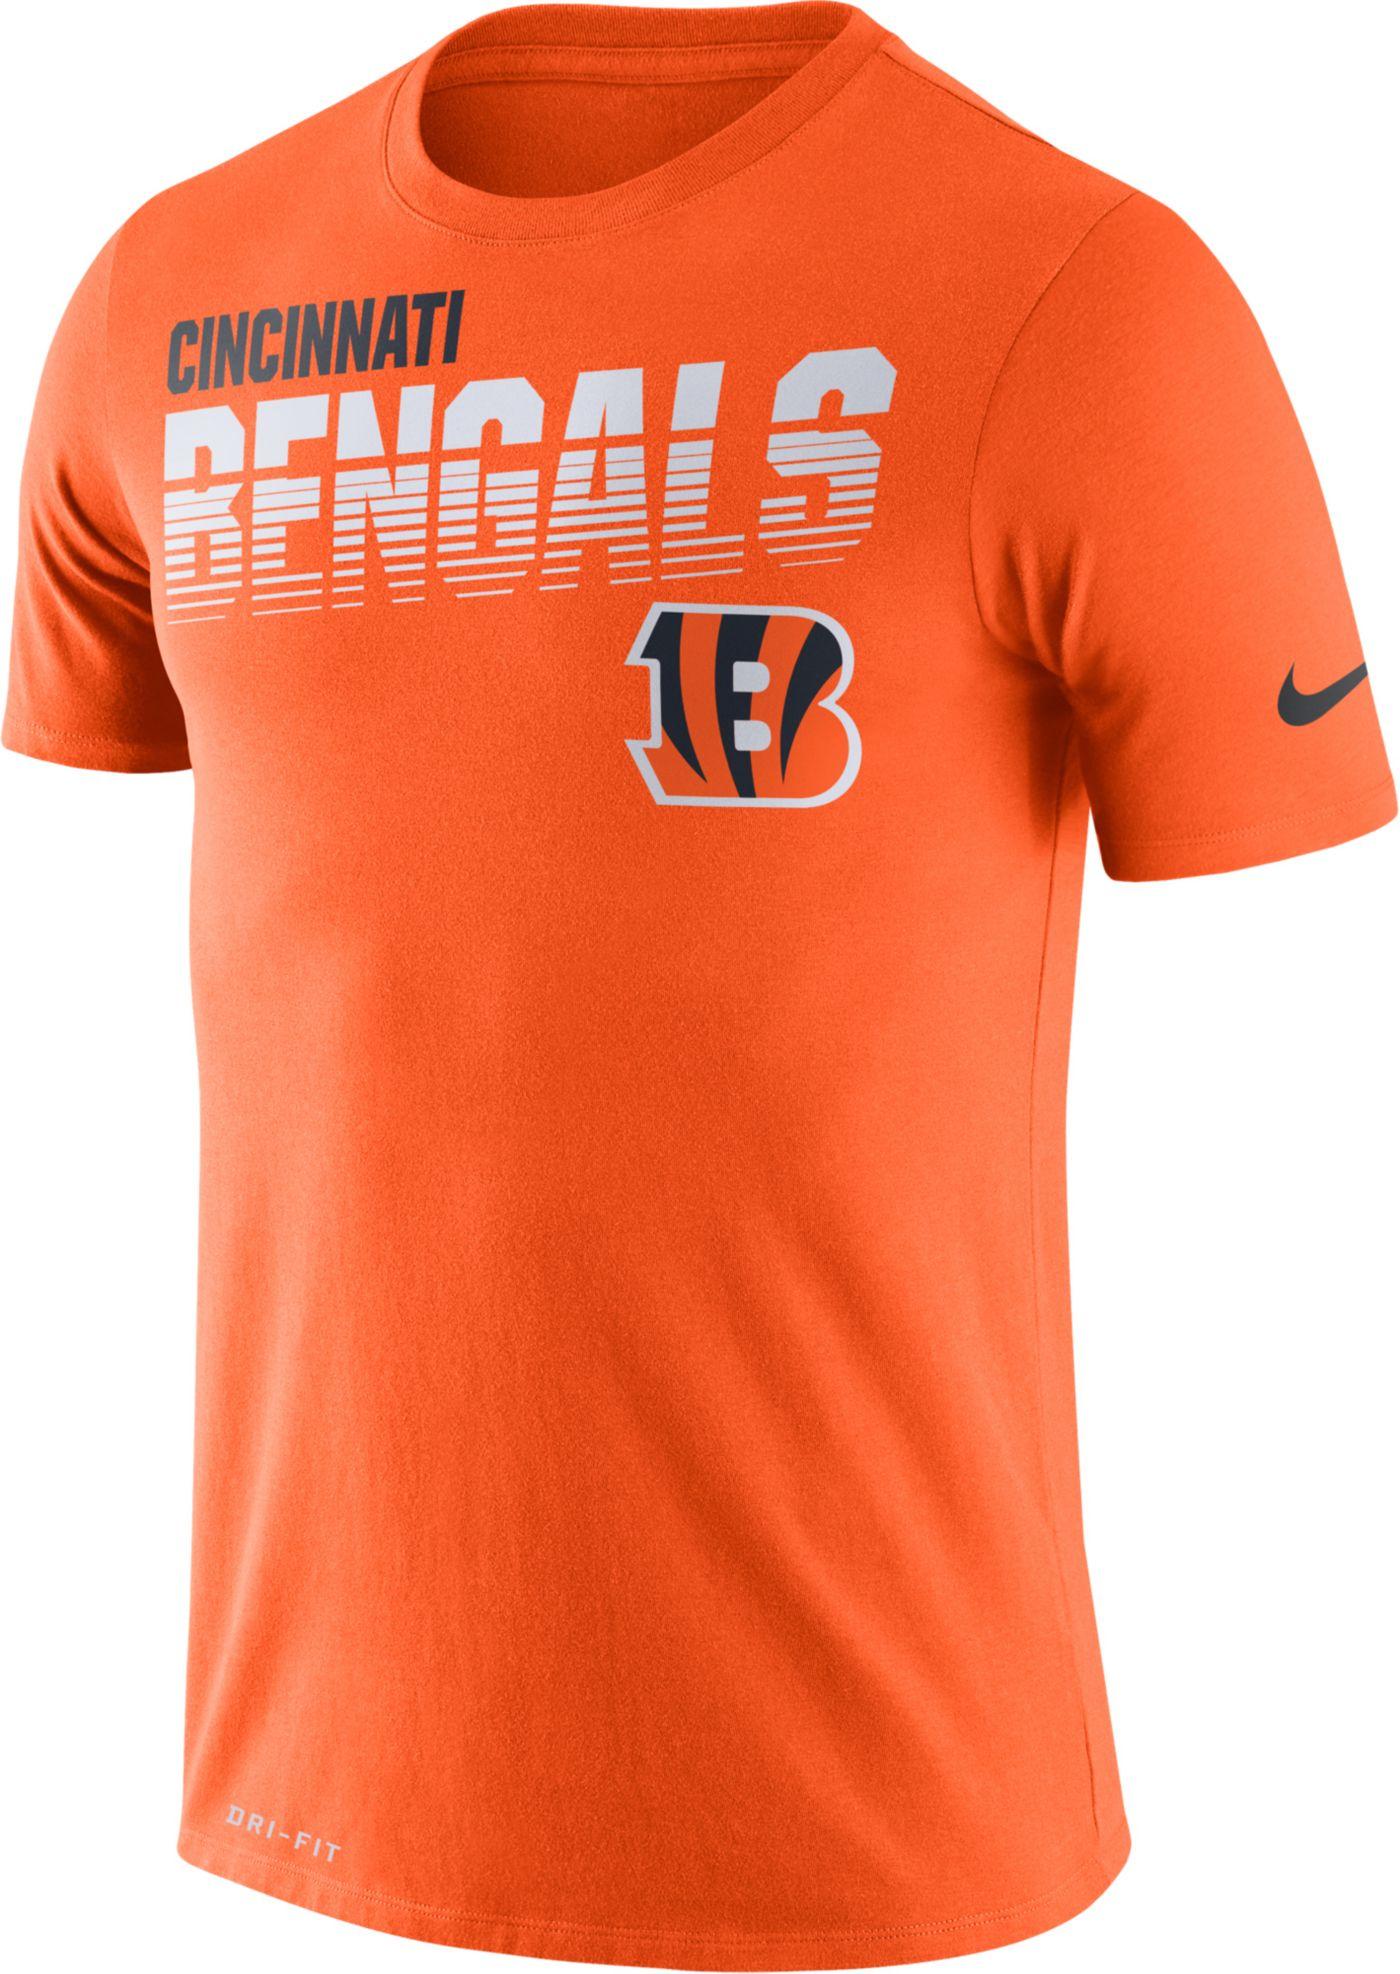 Nike Men's Cincinnati Bengals Sideline Legend Performance Orange T-Shirt